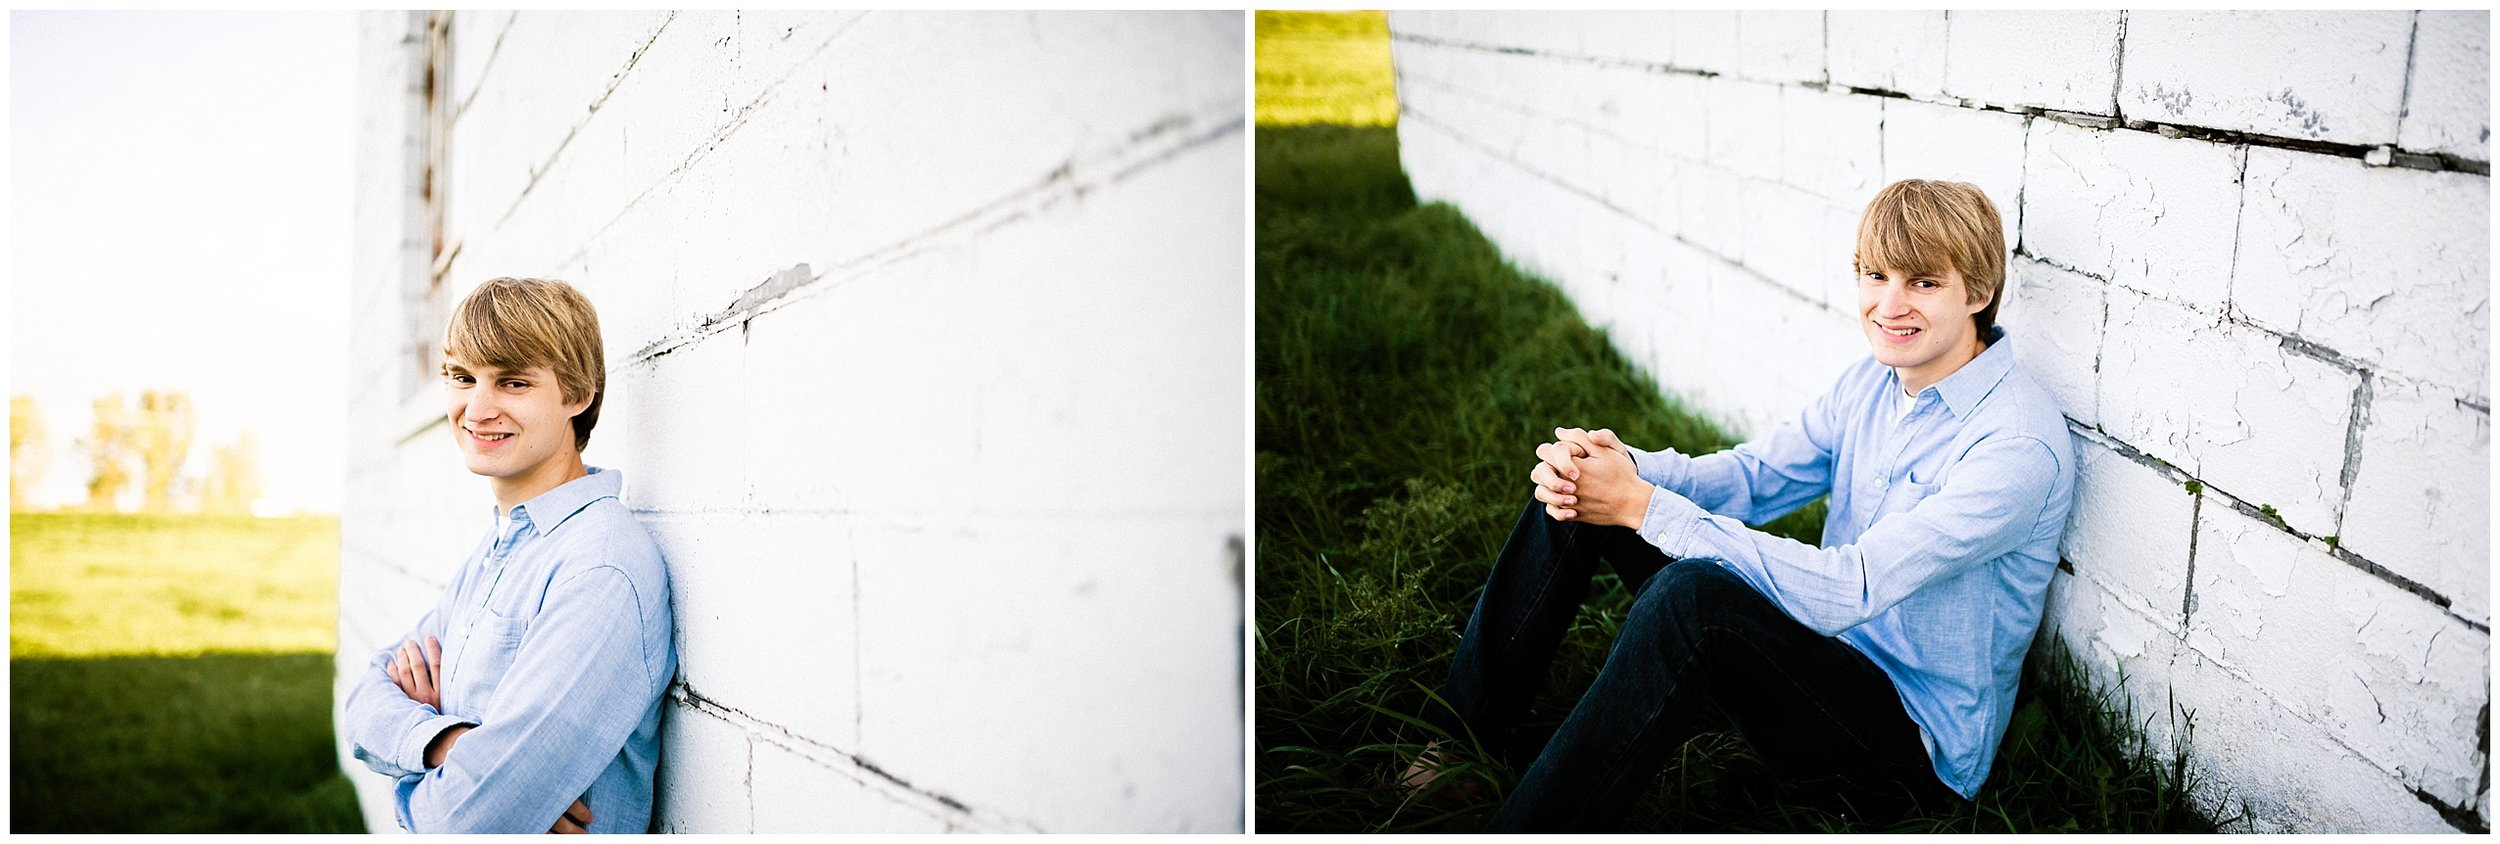 William | Senior #kyleepaigephotography_1312.jpg